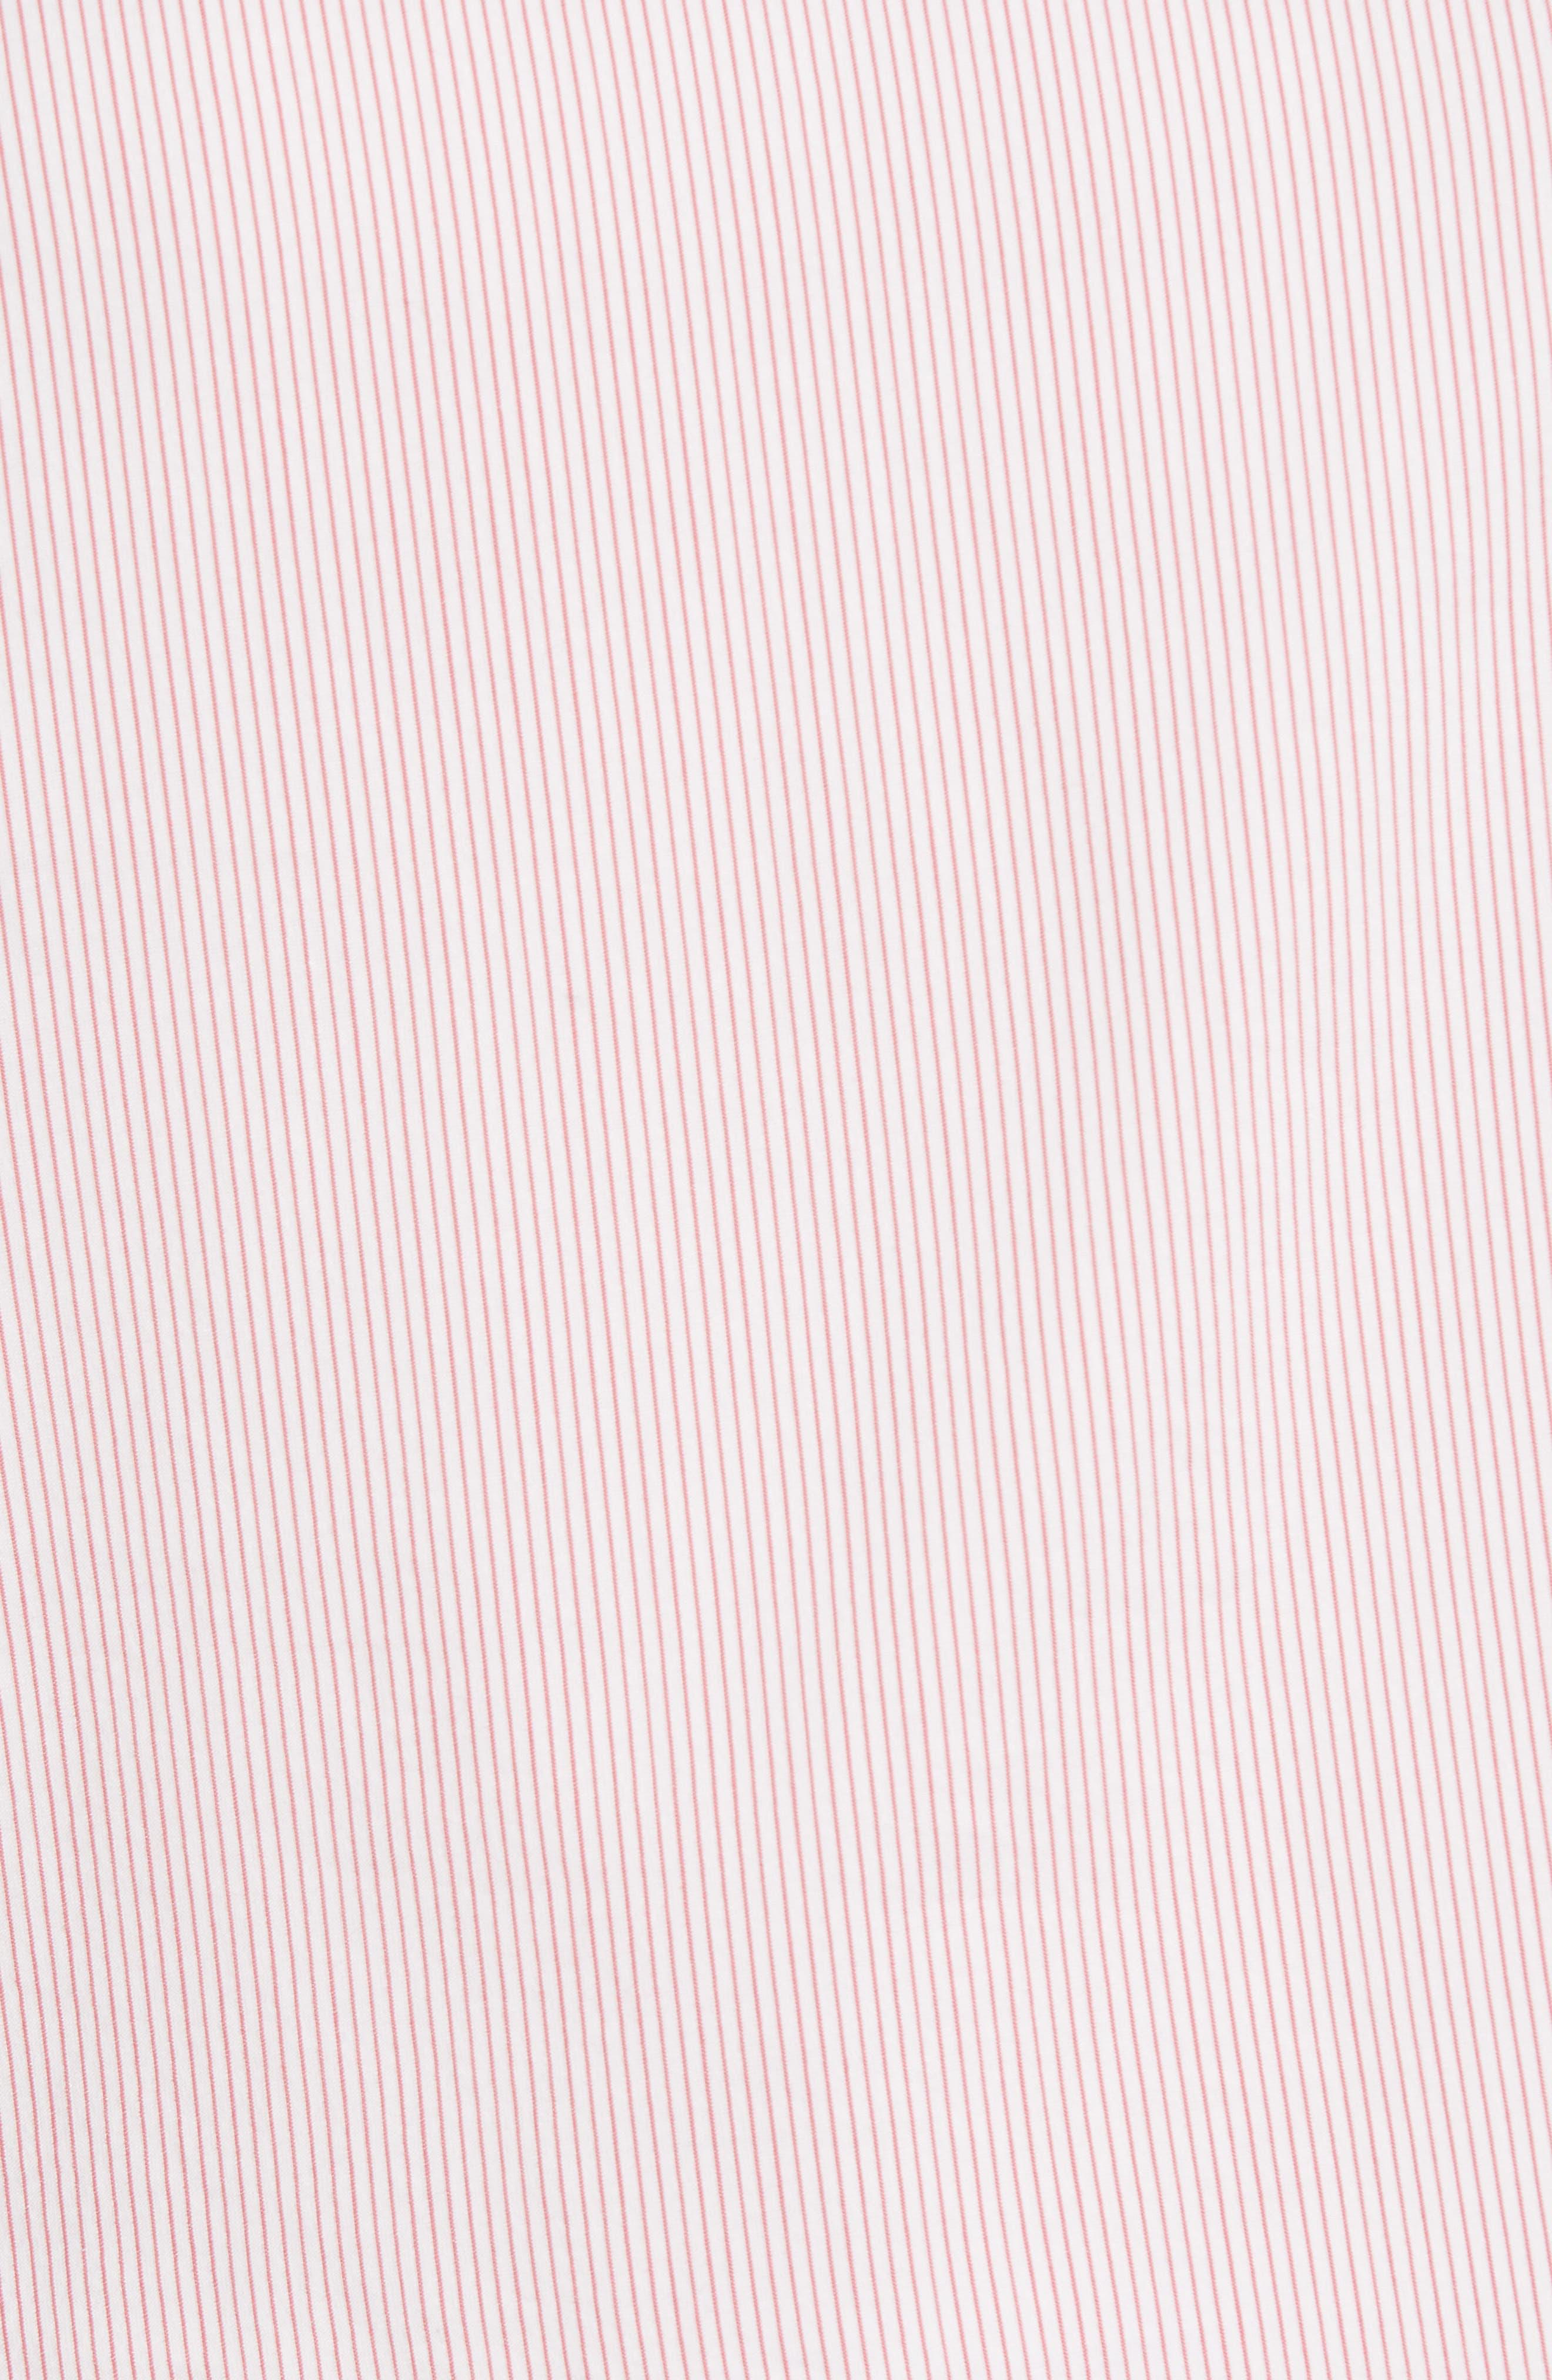 One-Shoulder Shirt,                             Alternate thumbnail 6, color,                             Pink Honey Chic Stripe